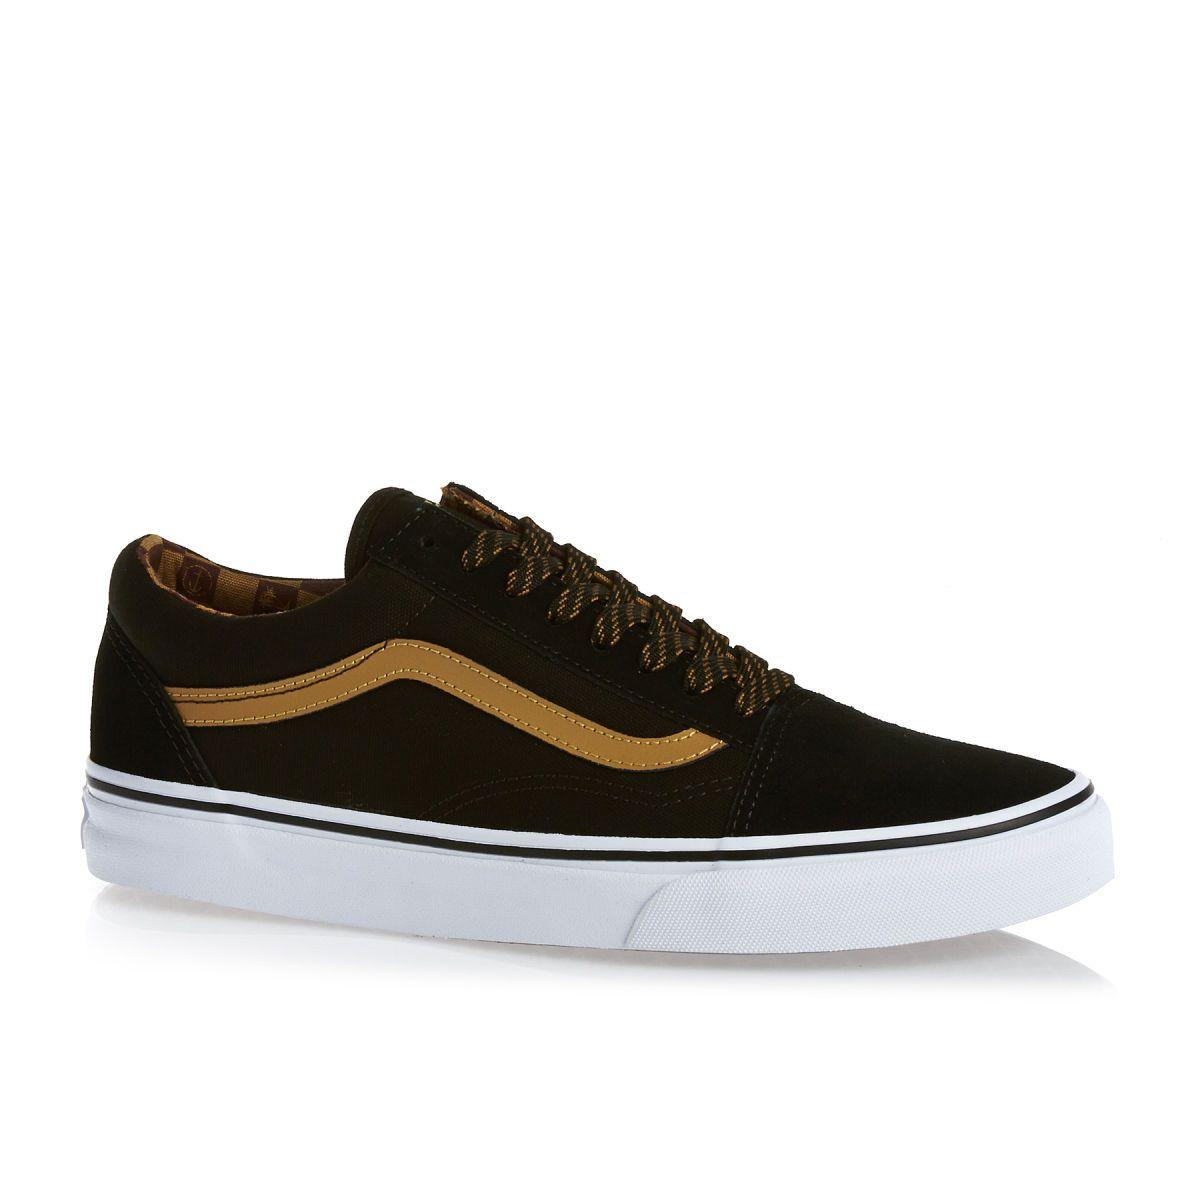 Vans Old Skool Shoes - Captain Fin Black/buckthorn Brown